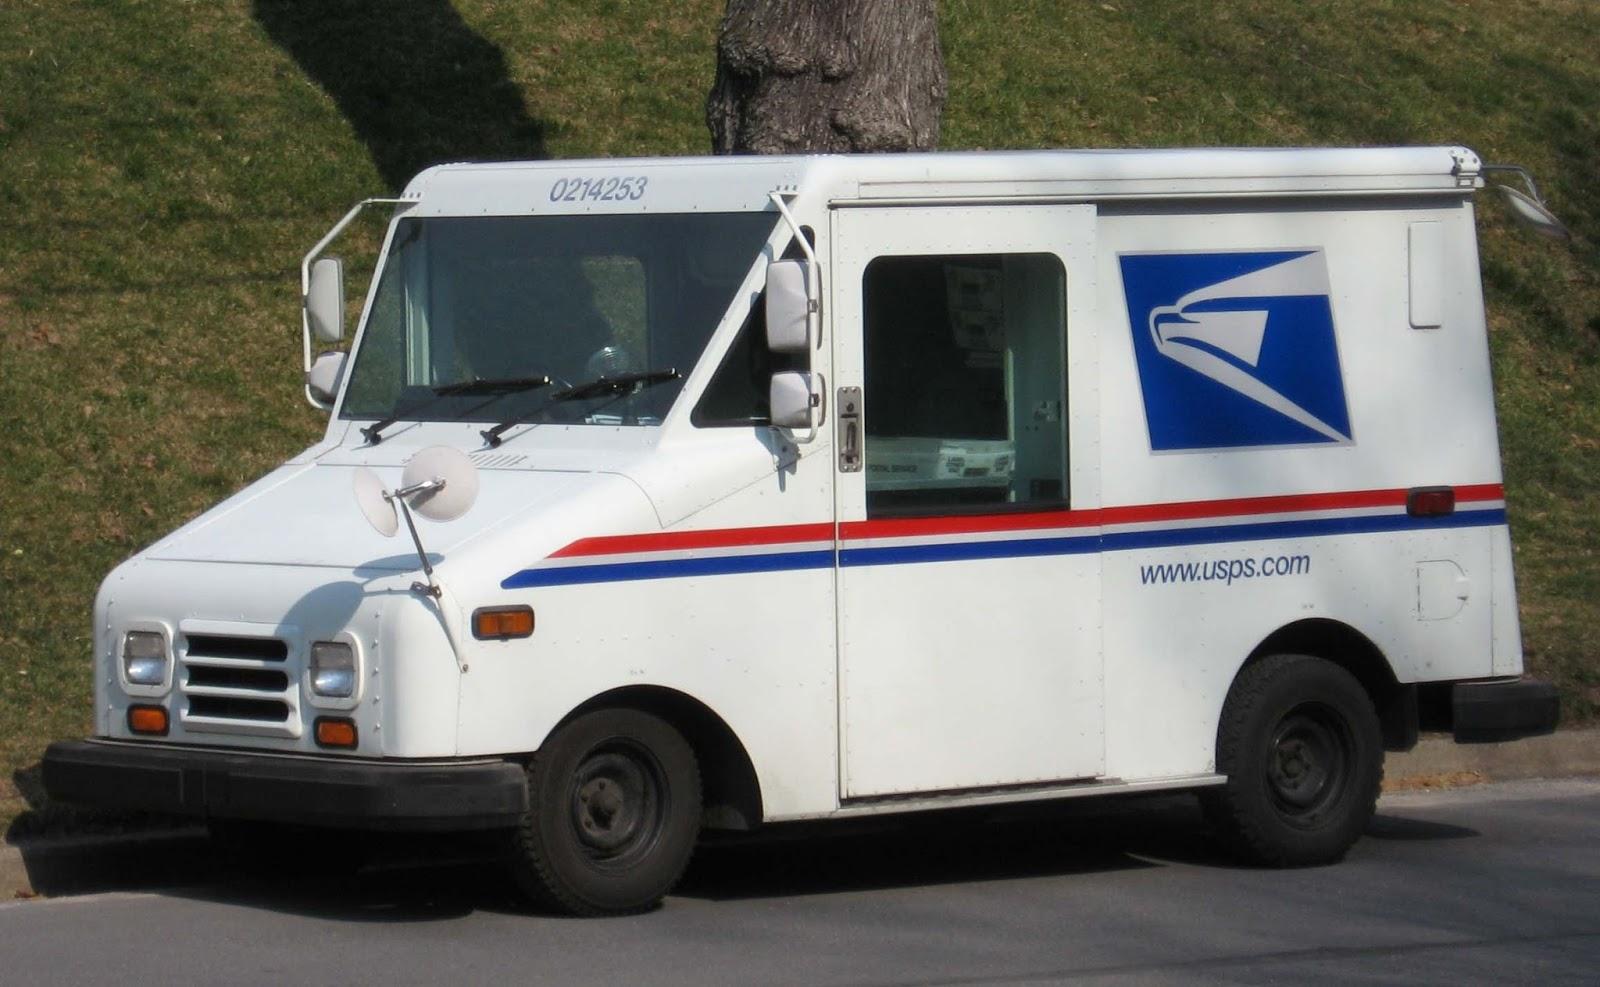 Llv Mail Truck Sale - Usps mail truck specs engine post office grumman llv random automotive dylan benson